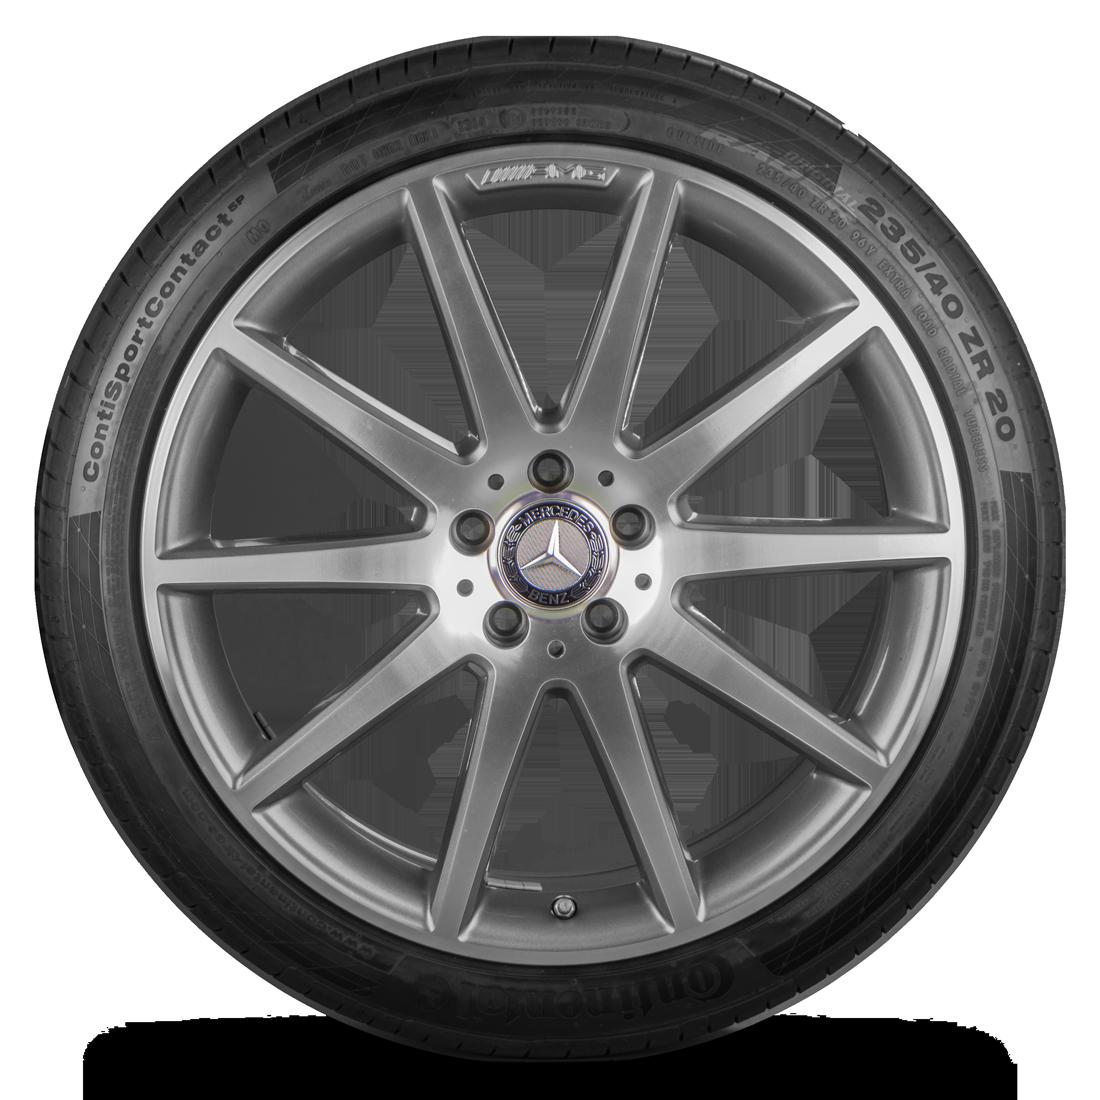 AMG 20 Zoll Felgen Mercedes GLA 45 X156 Alufelgen Sommerreifen Sommerräder 7 mm